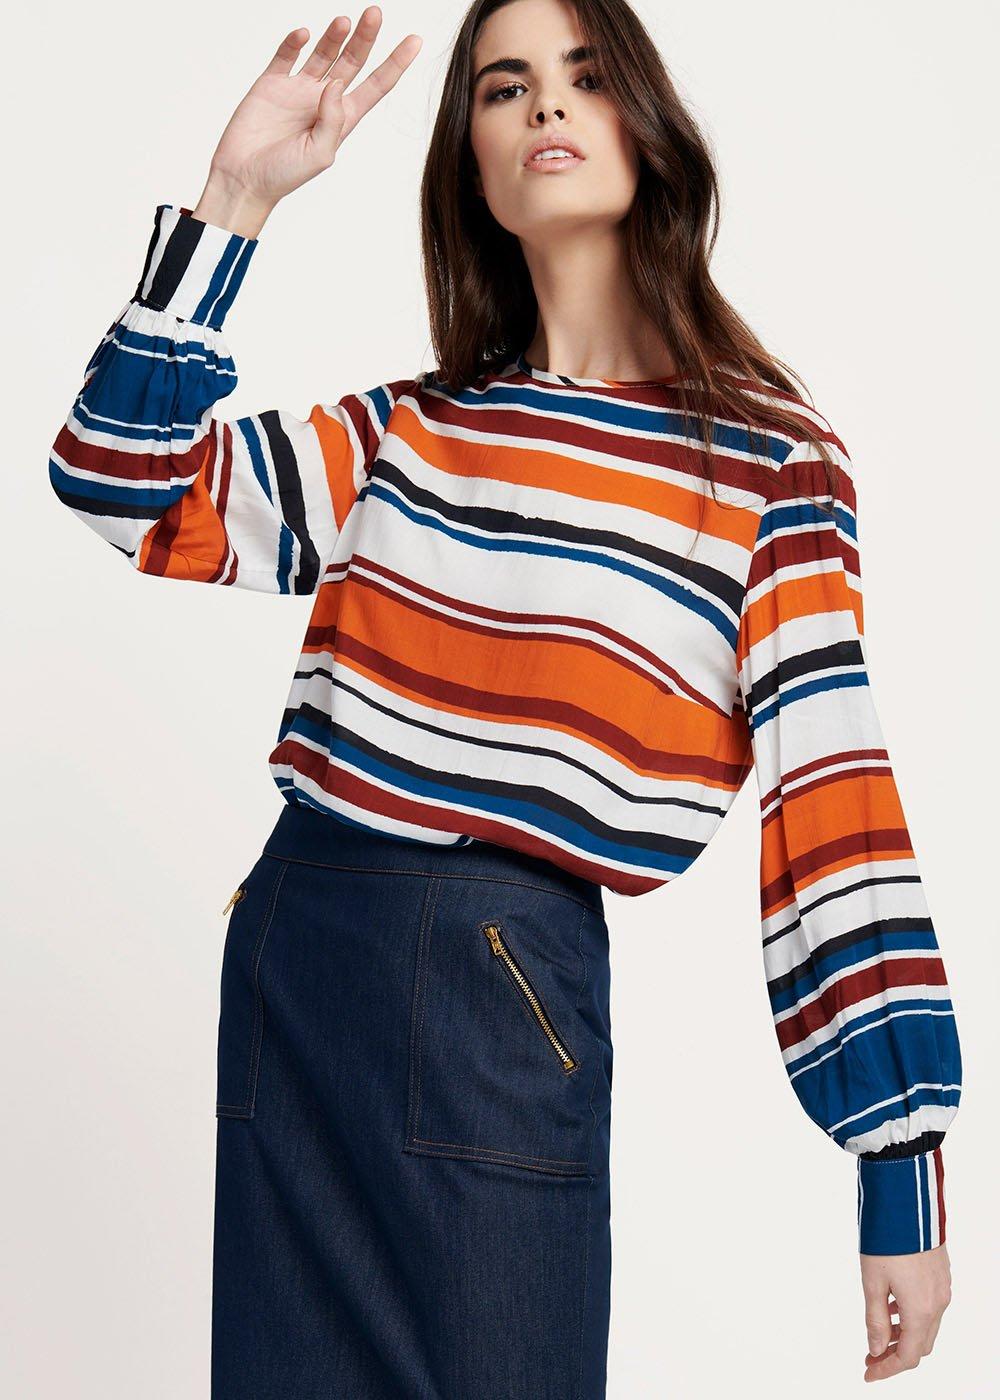 Shayla viscose T-shirt with horizontal stripes patterns